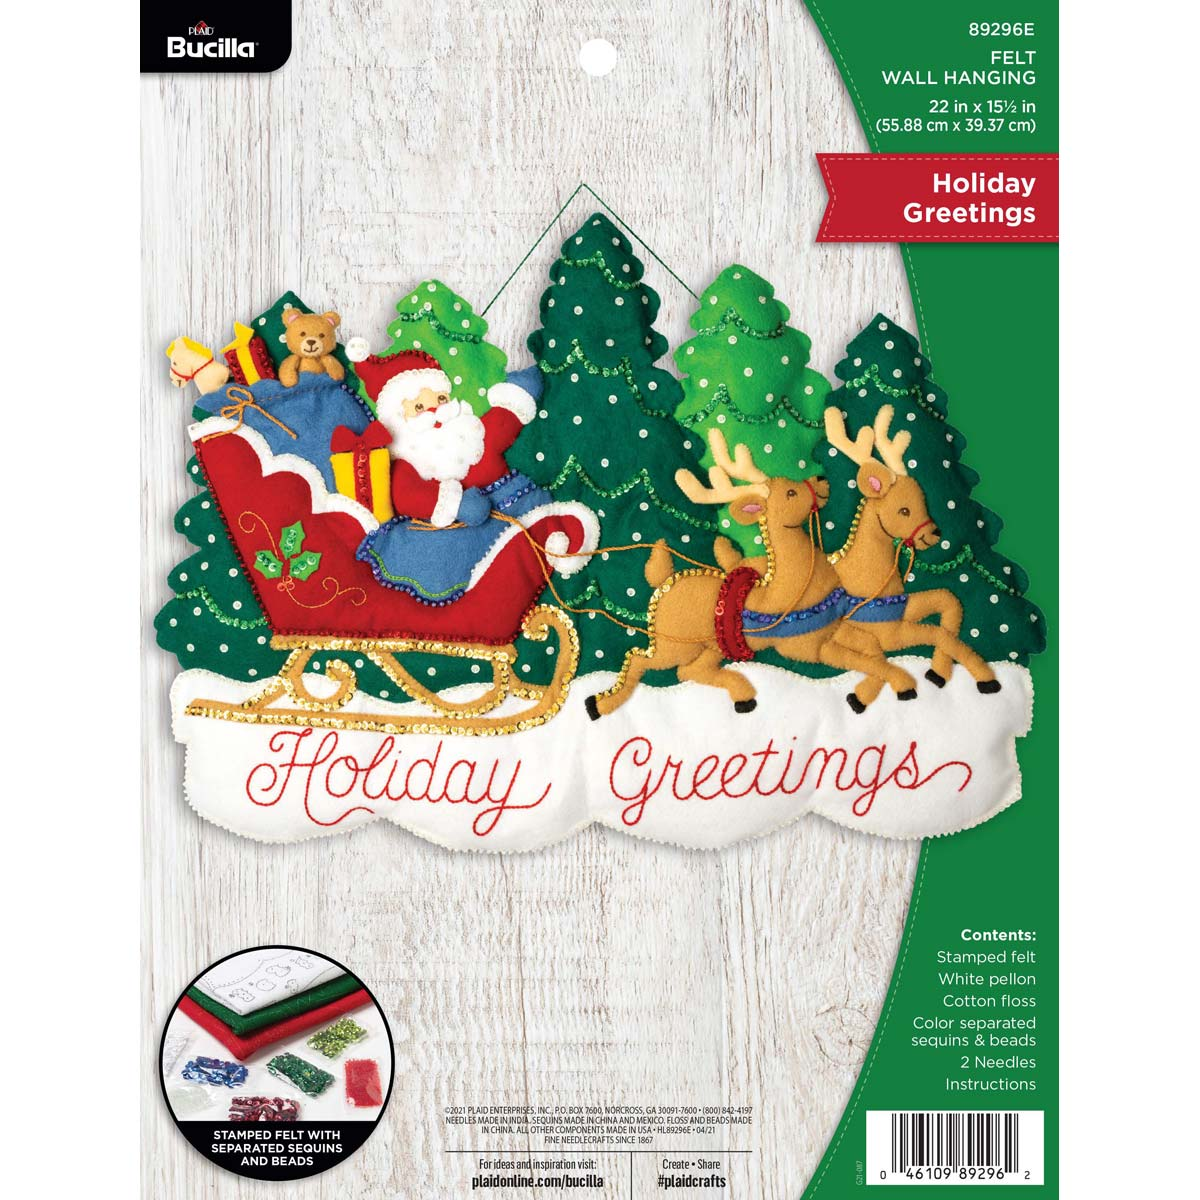 Bucilla ® Seasonal - Felt - Home Decor -  Holiday Greetings Wall Hanging - 89296E